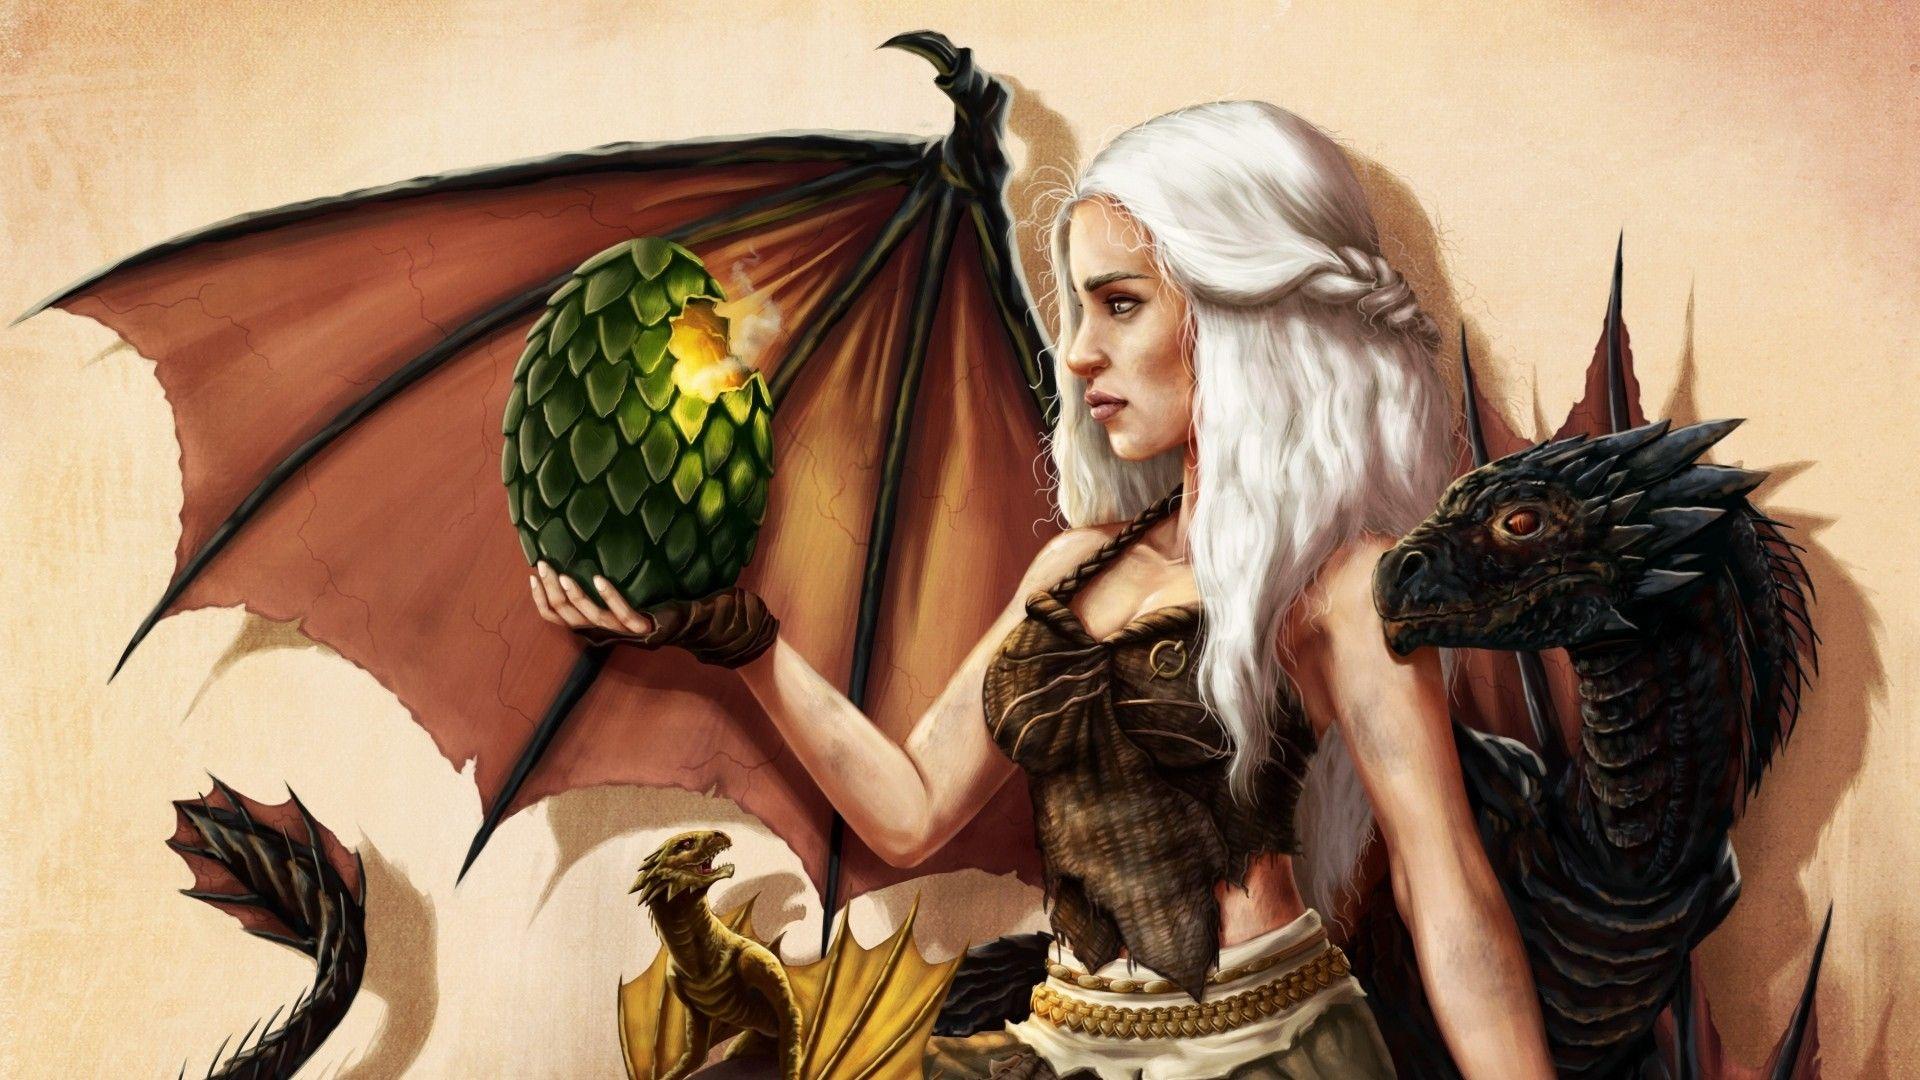 Game of Thrones Daenerys fanart